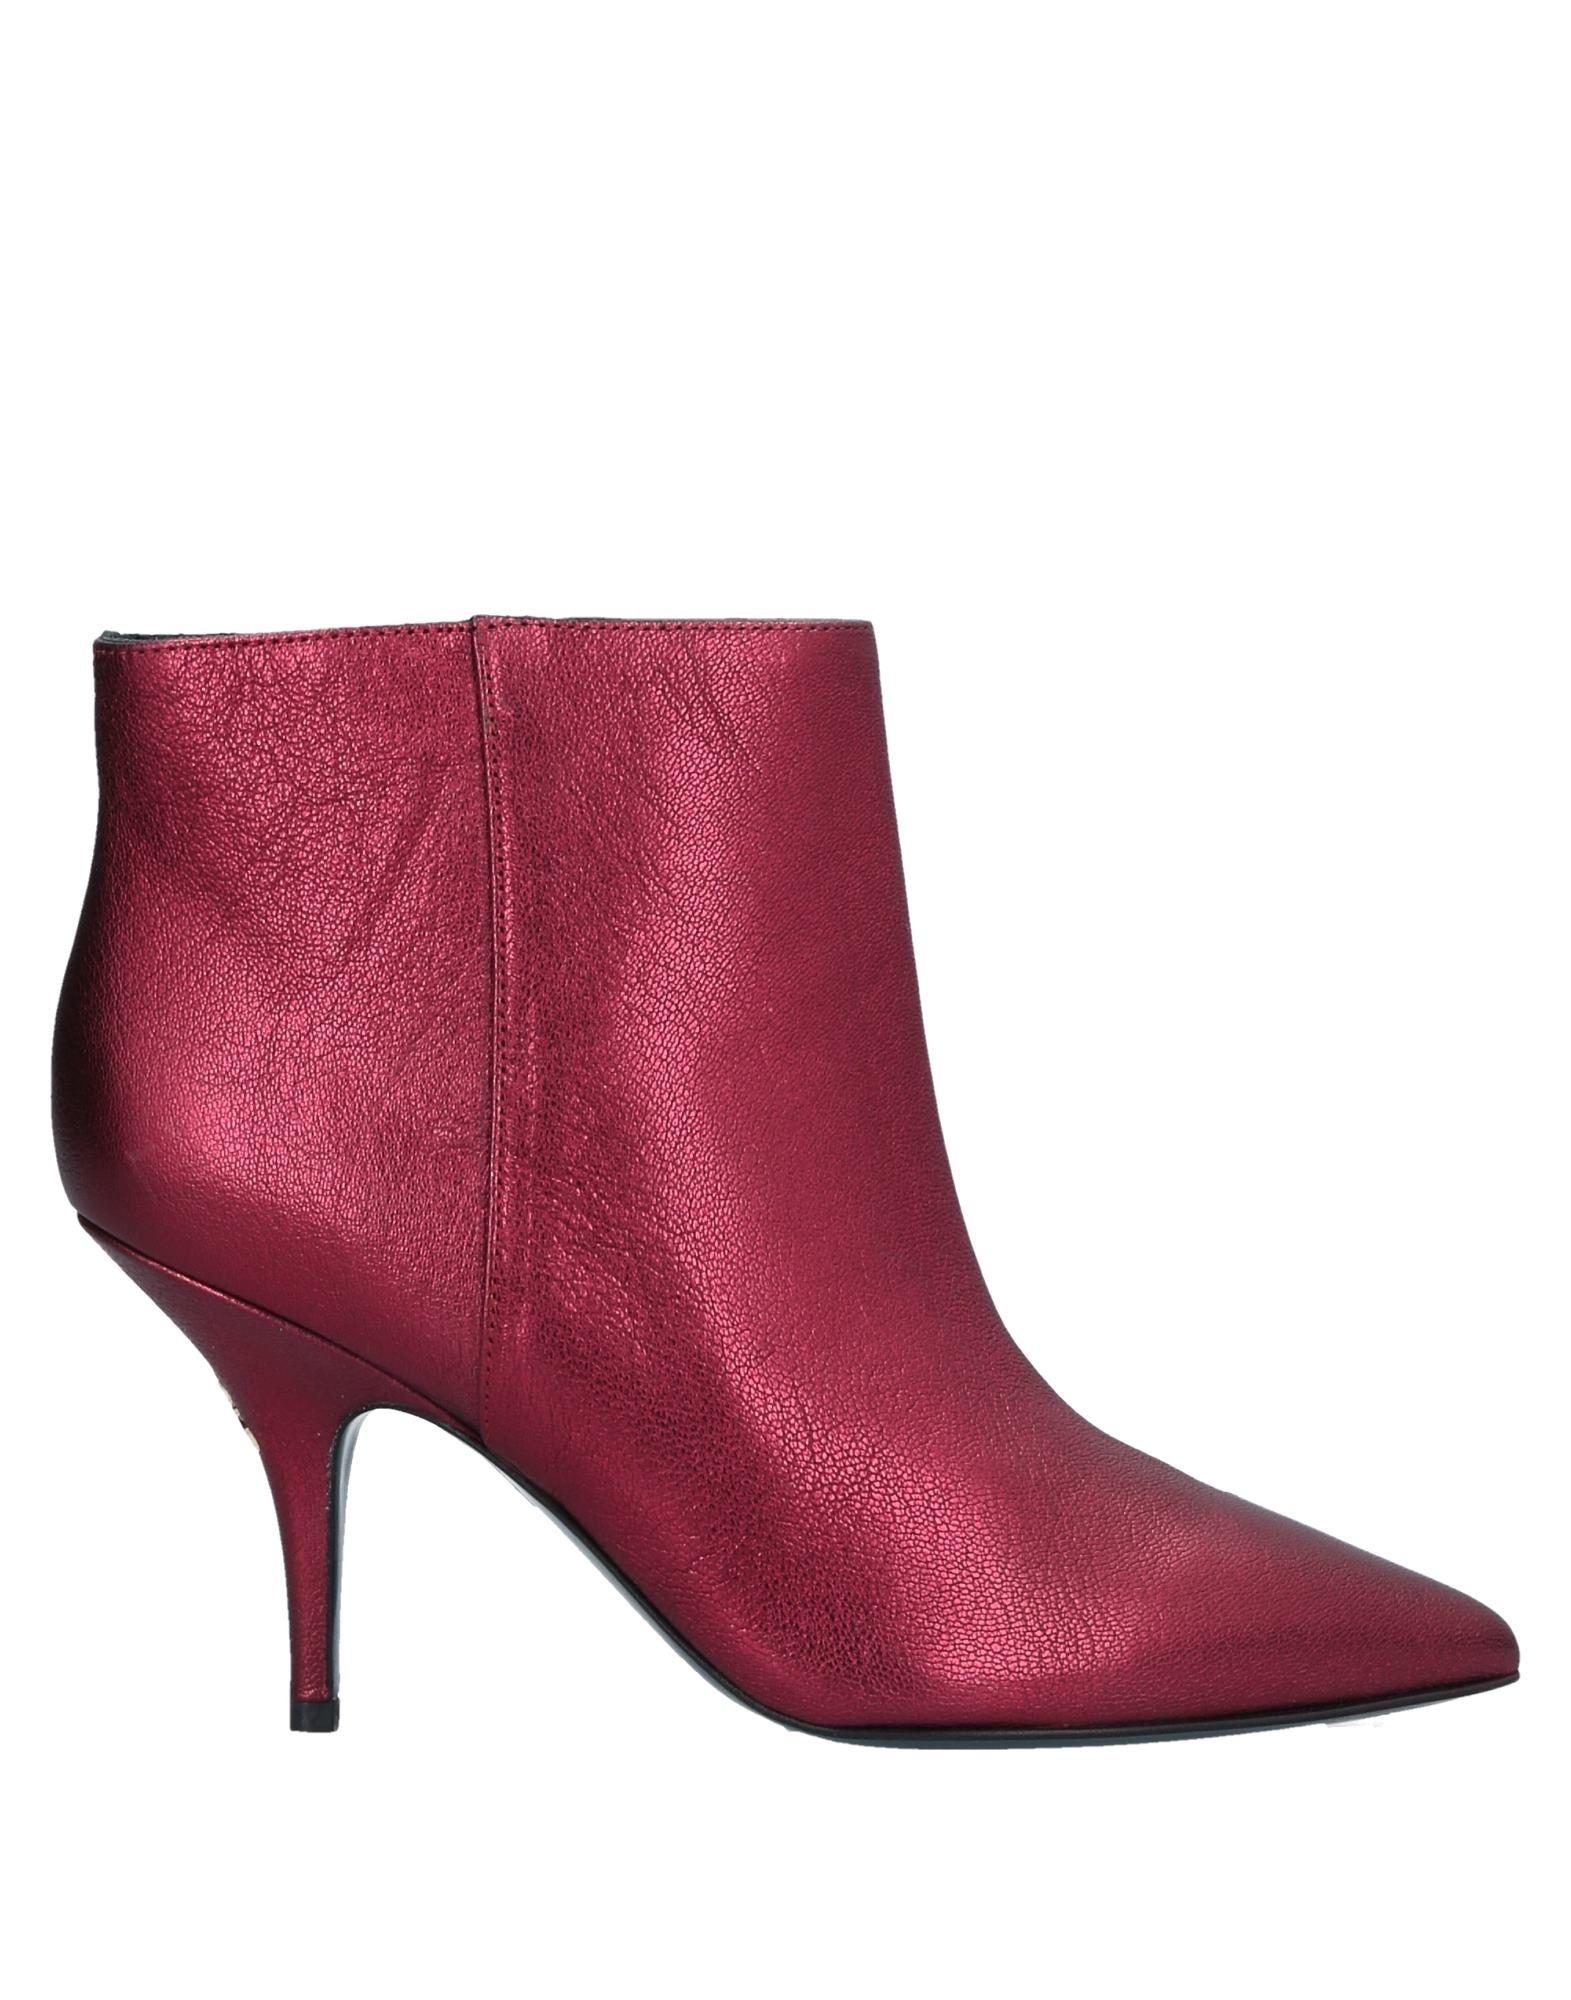 Patrizia Schuhe Pepe Stiefelette Damen  11521810UX Neue Schuhe Patrizia 935b3a